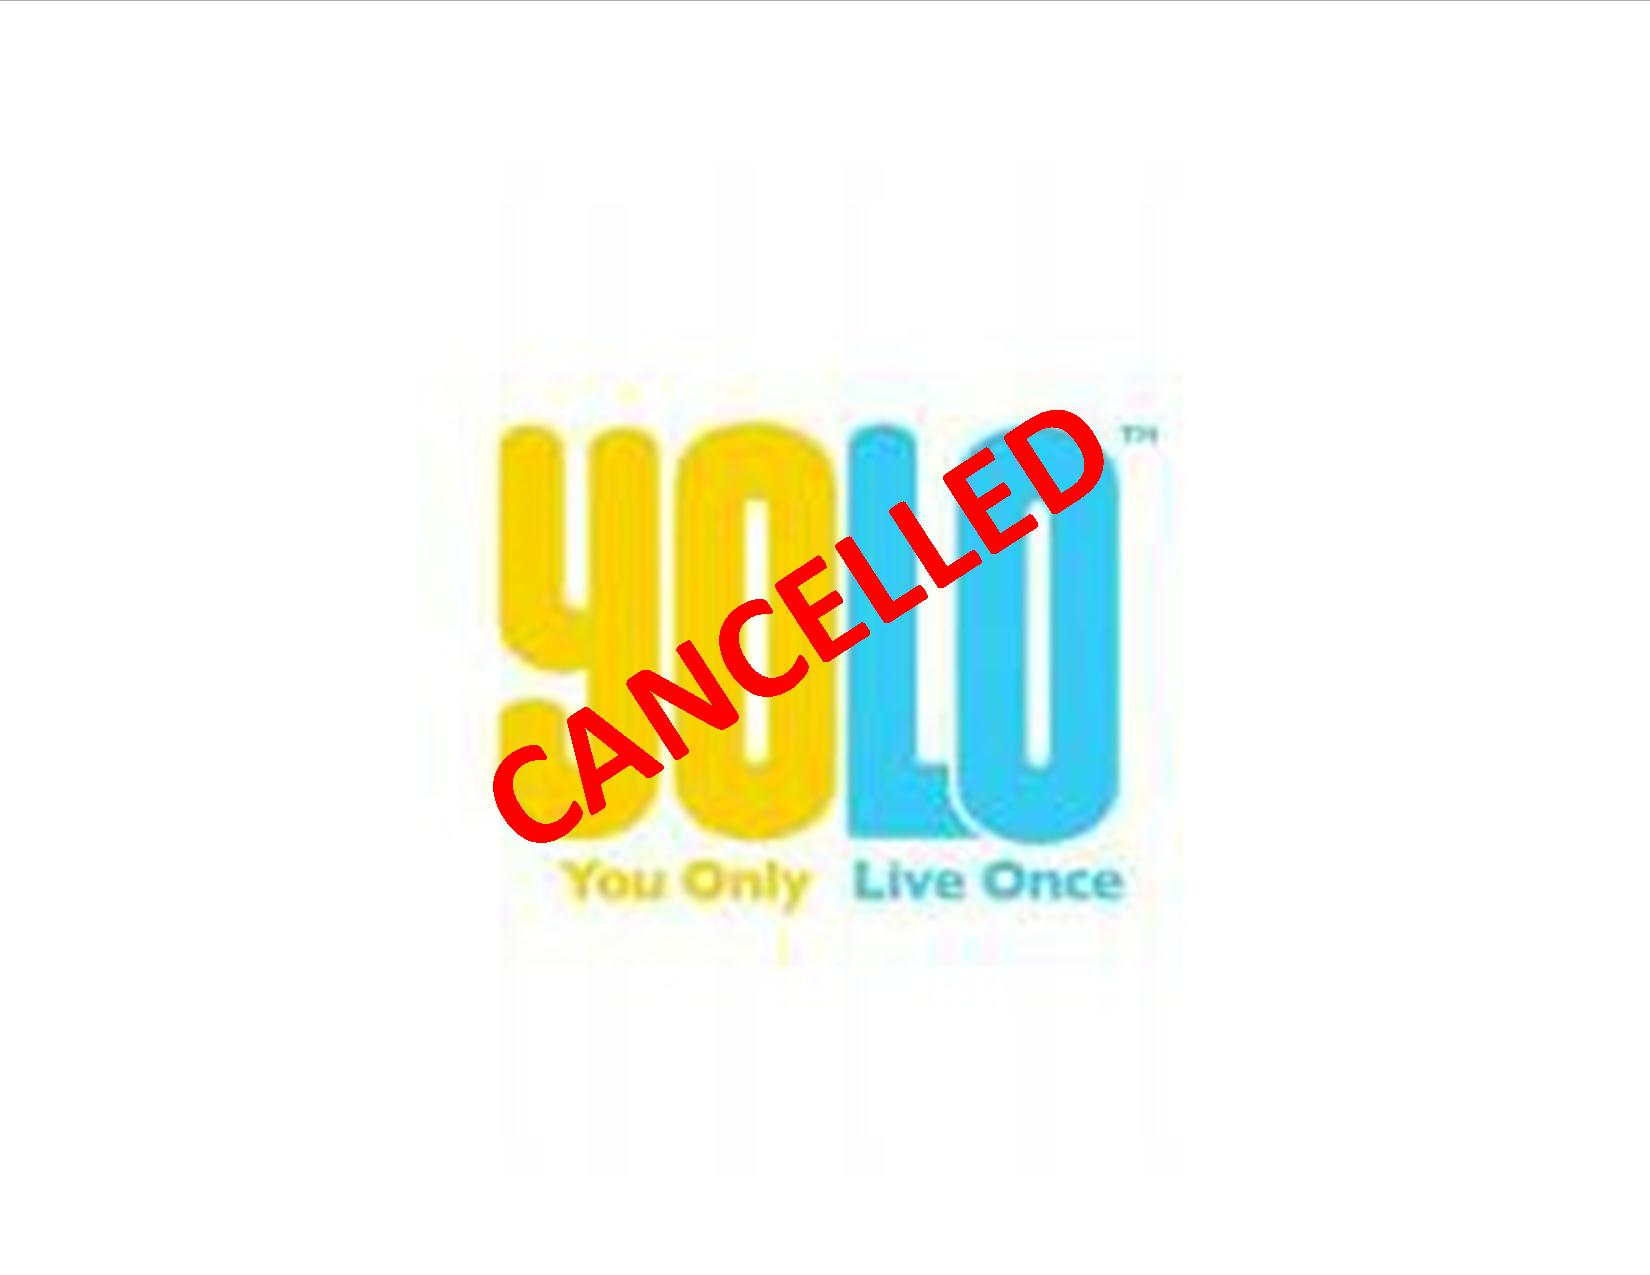 YOLO Cancelled?